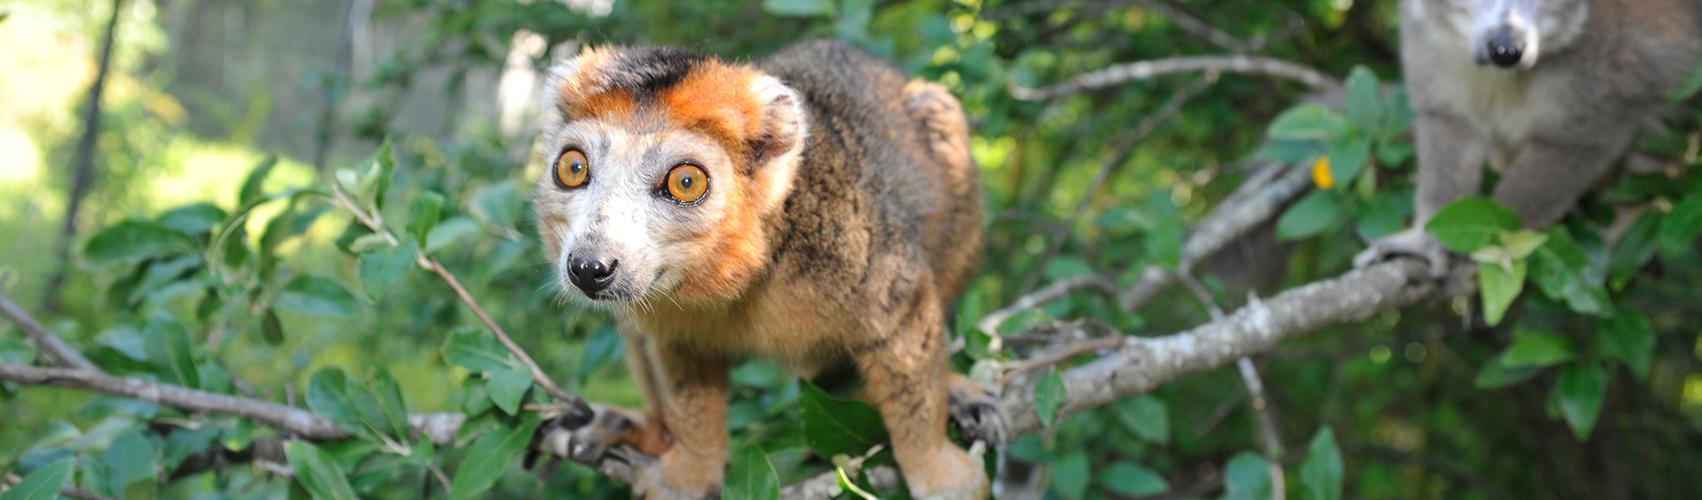 Pet Lemurs The Pet To Regret Duke Lemur Center